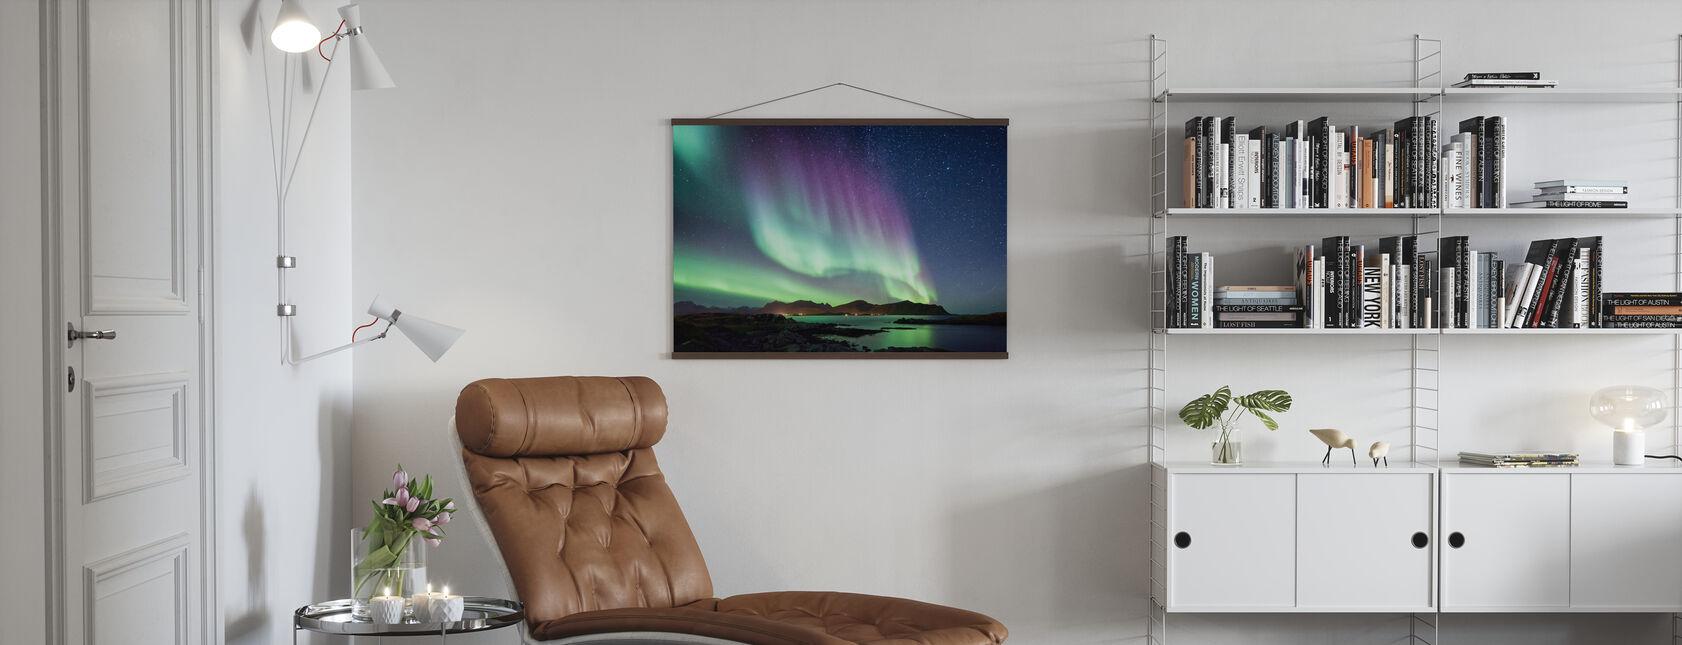 Aurora Borealis Northern Lights - Poster - Living Room